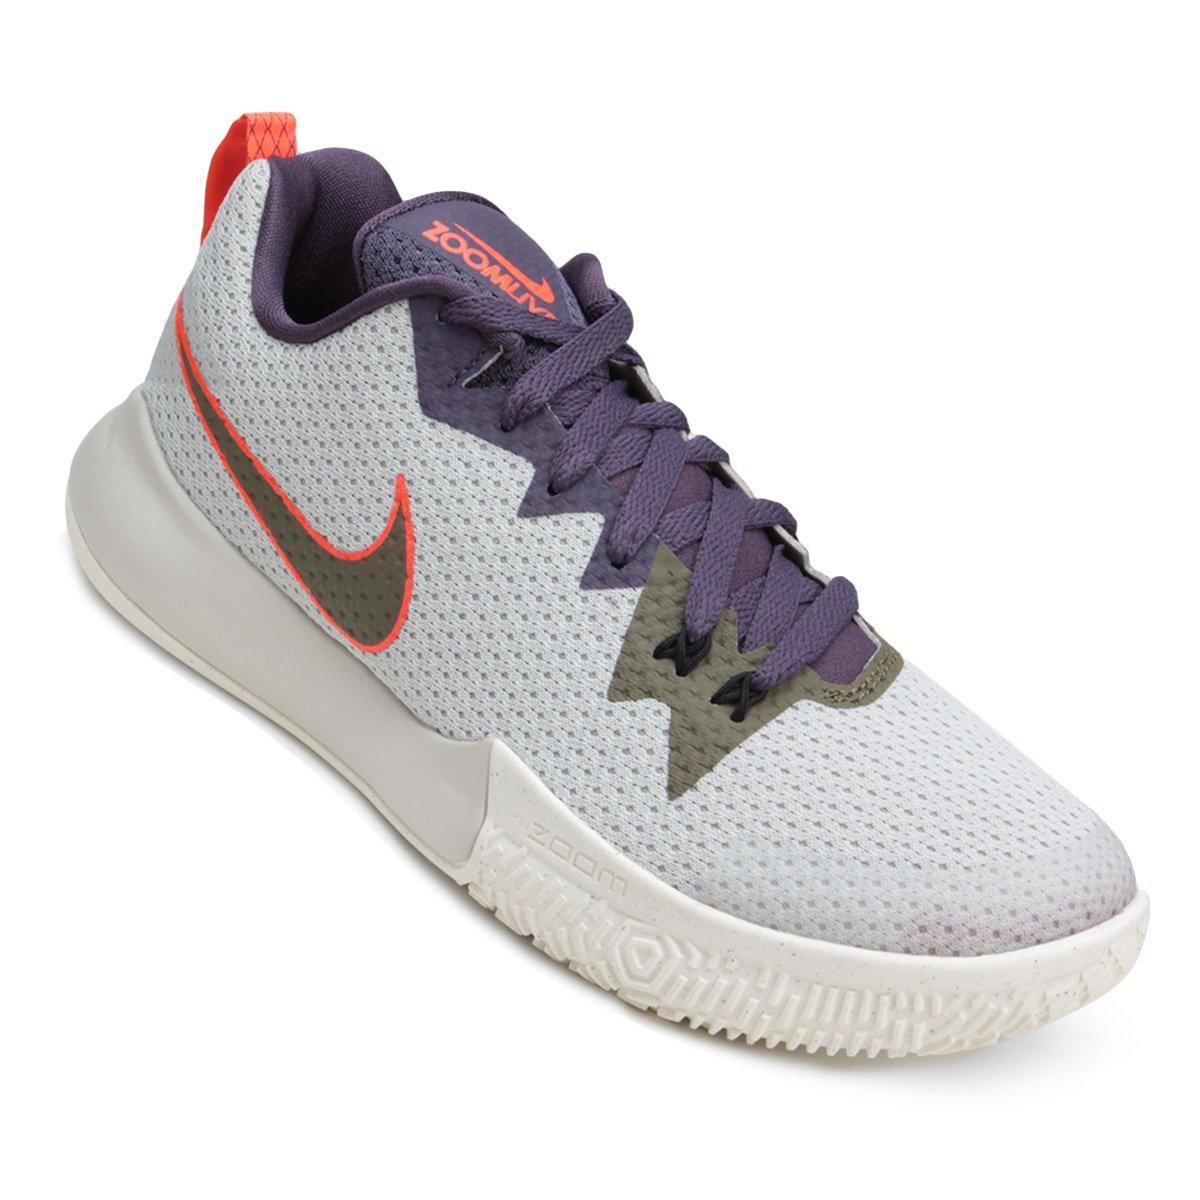 dar a entender desmayarse Sangrar  Tênis Nike Zoom Live II Masculino - Branco e Roxo   Loja NBA